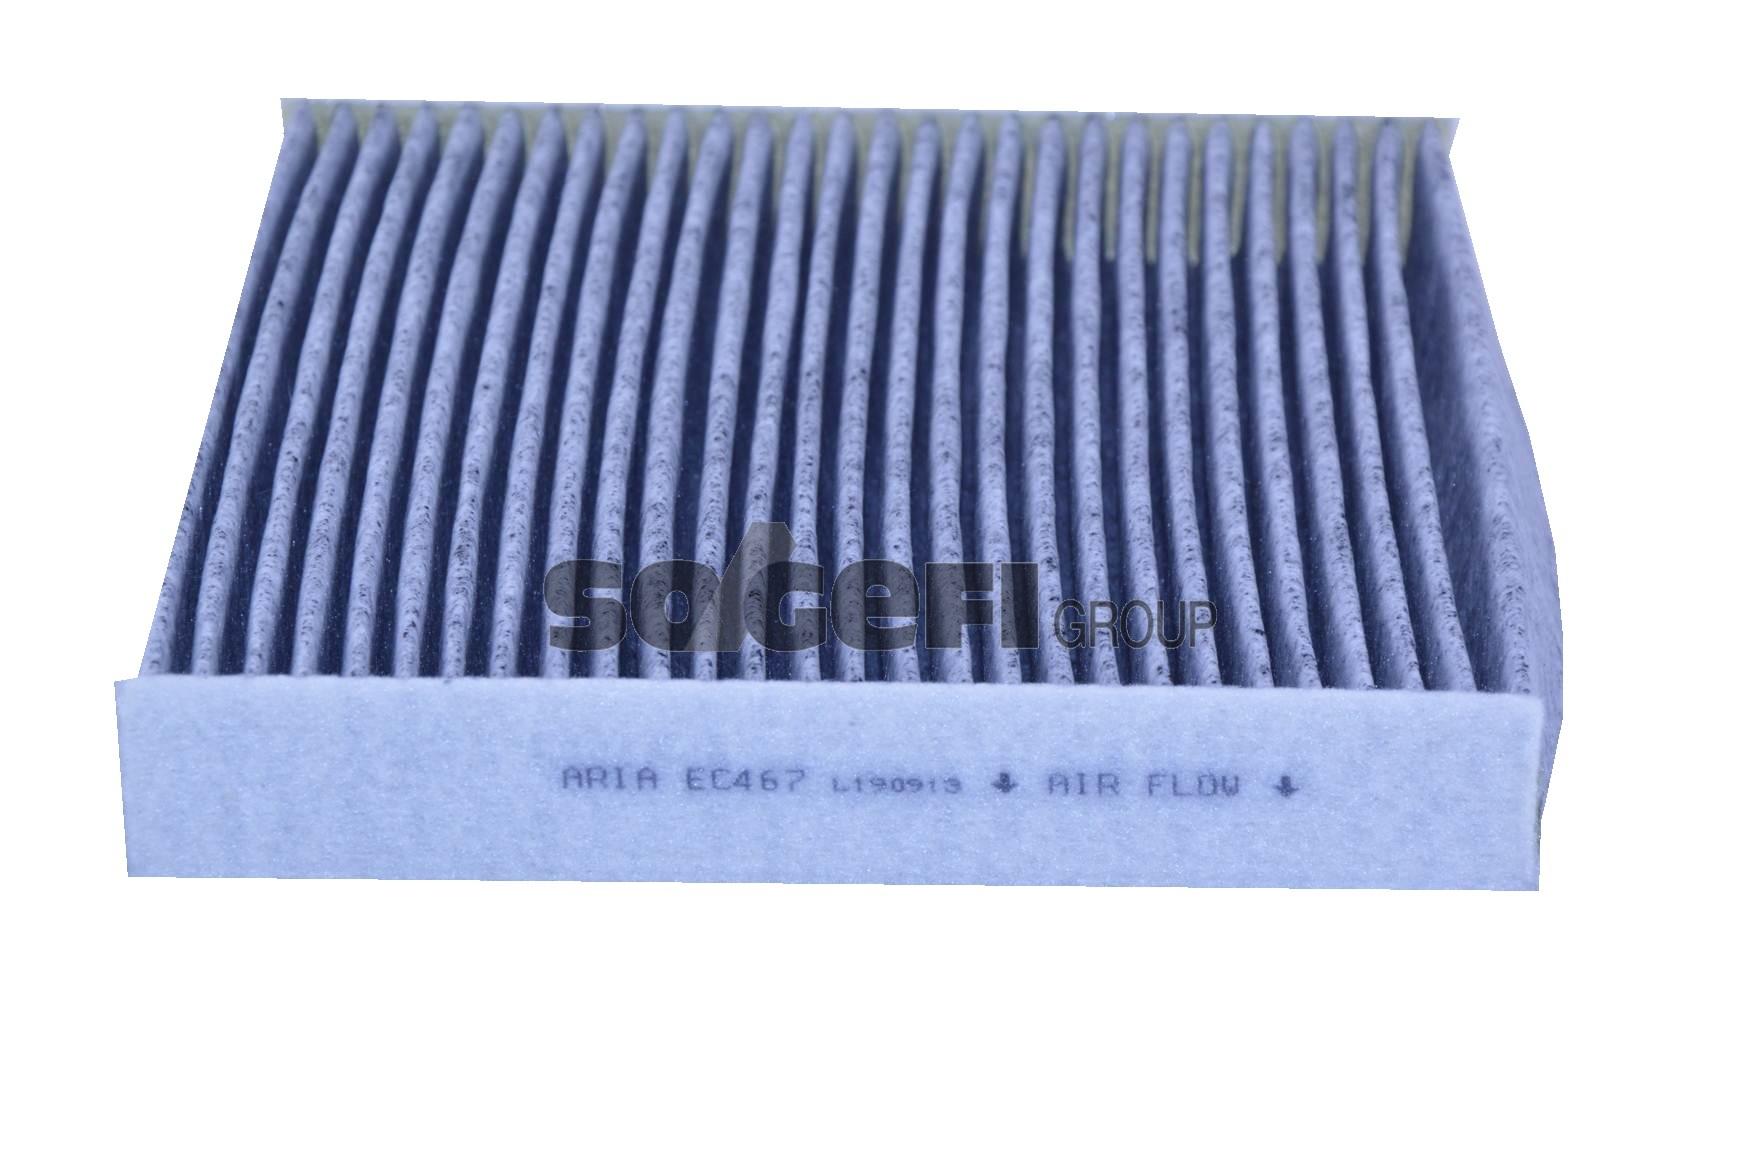 Tecnocar EC416 Filter interior air